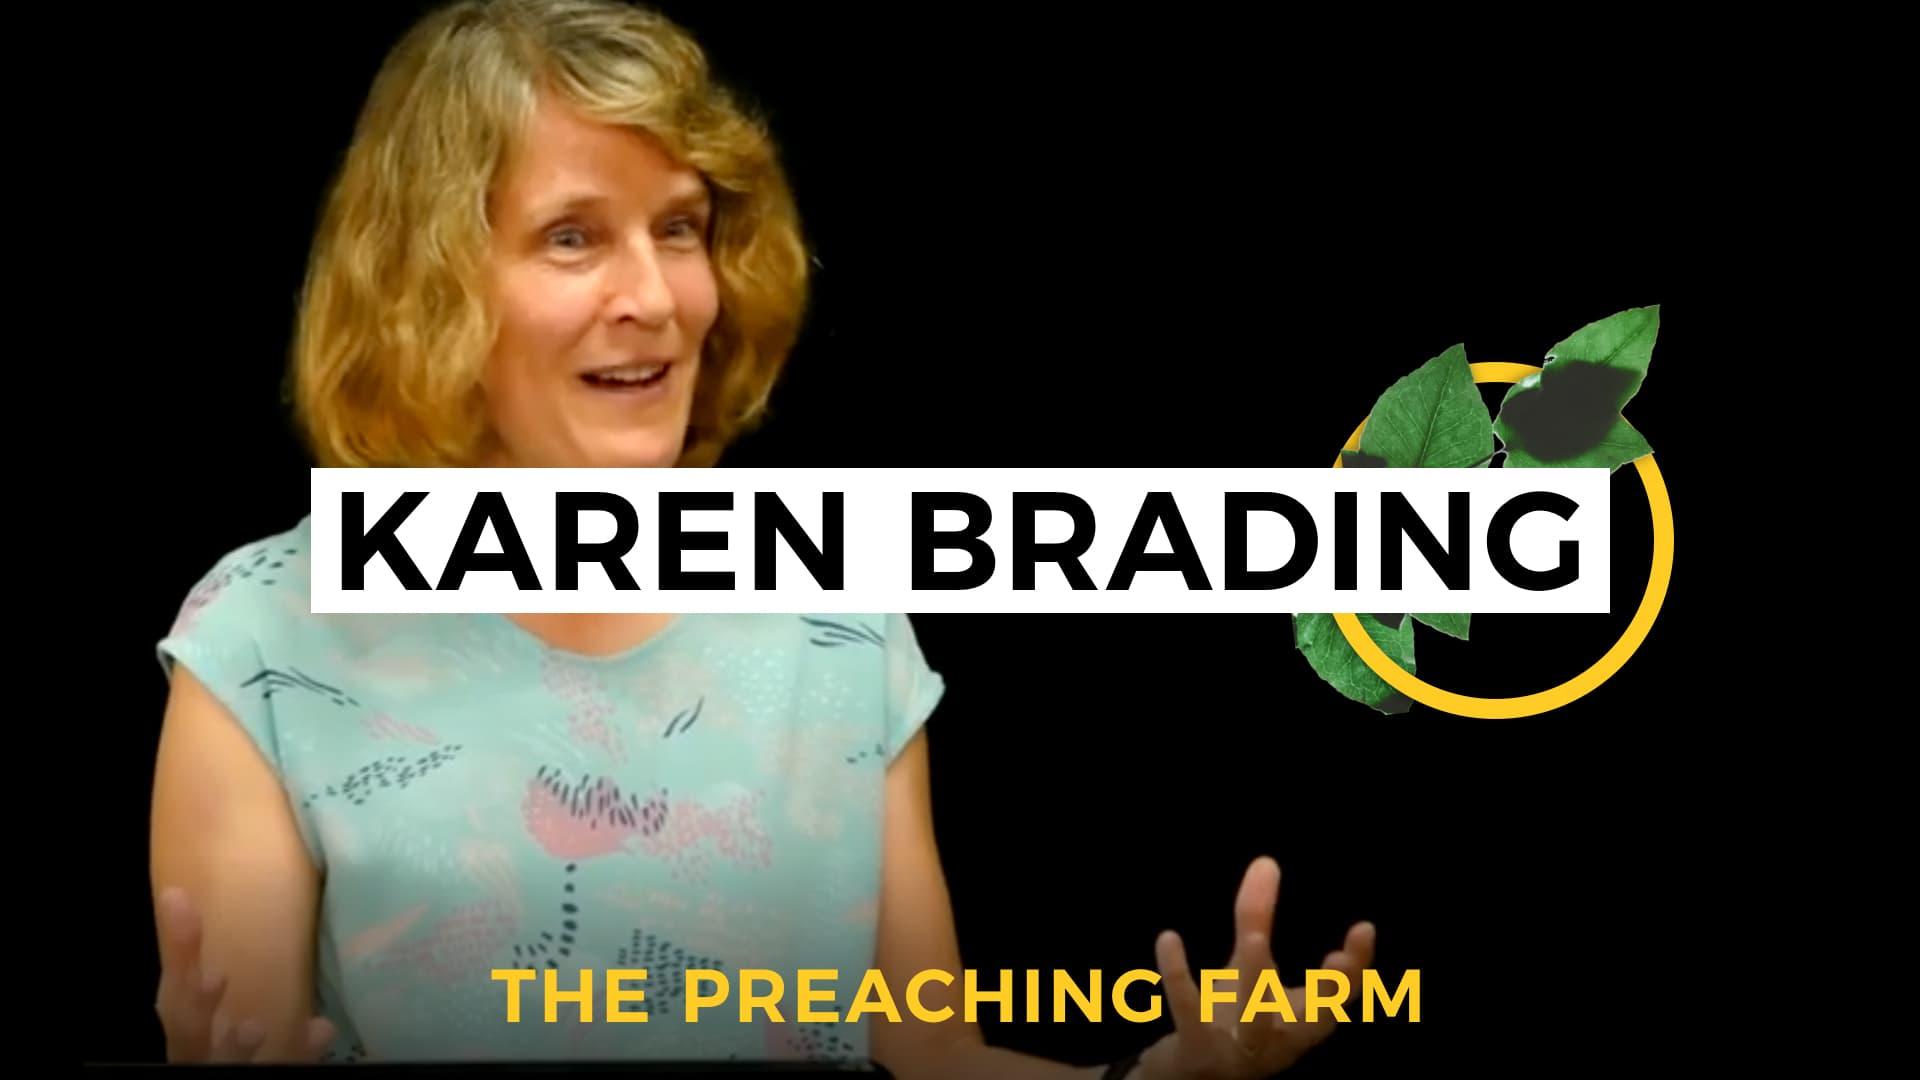 The Preaching Farm 1: Karen Brading